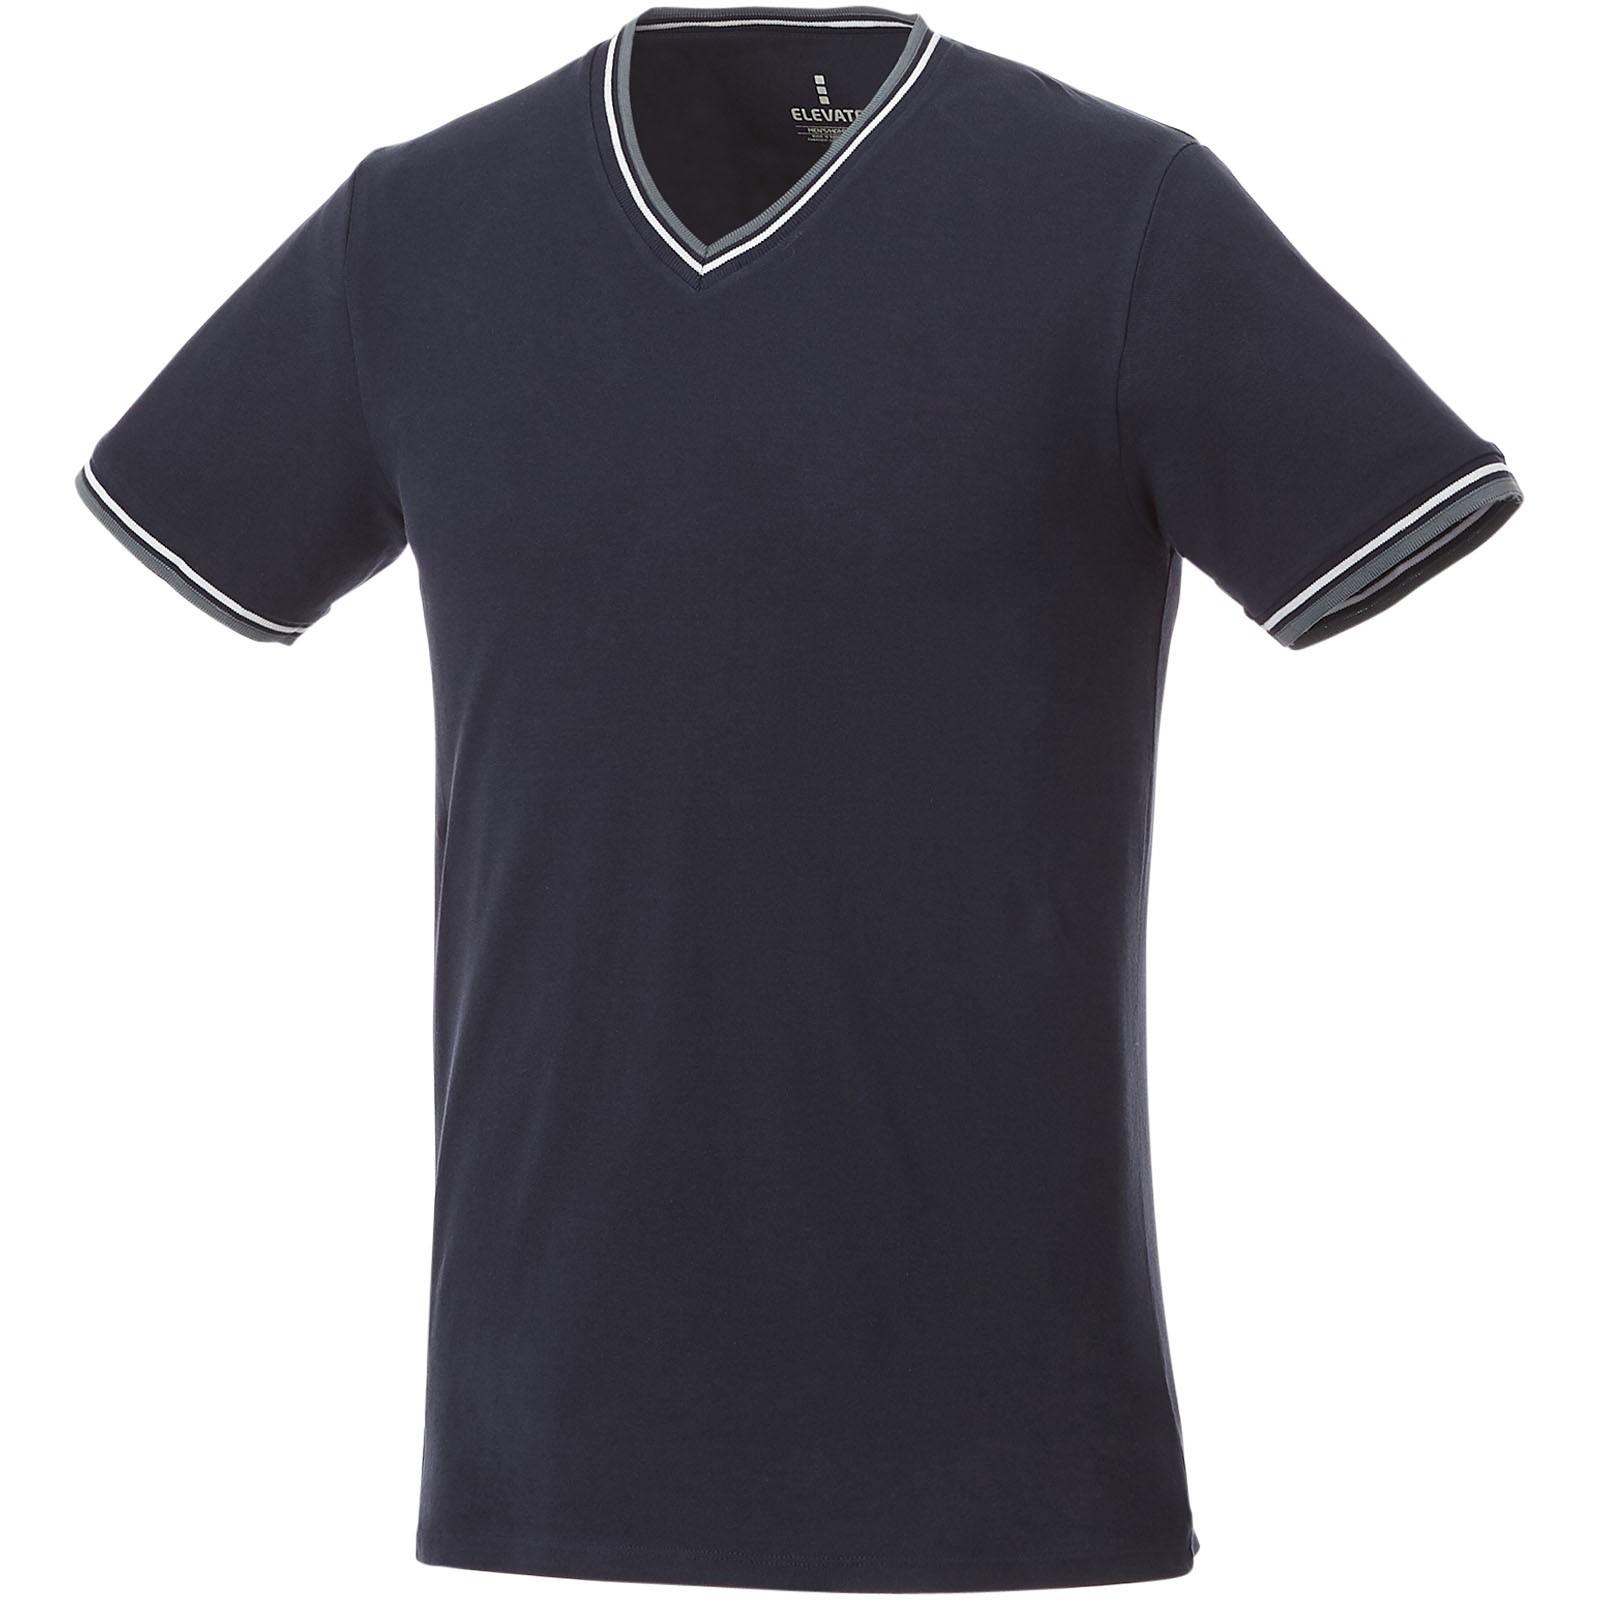 Elbert short sleeve men's pique t-shirt - Navy / Grey melange / White / XXL